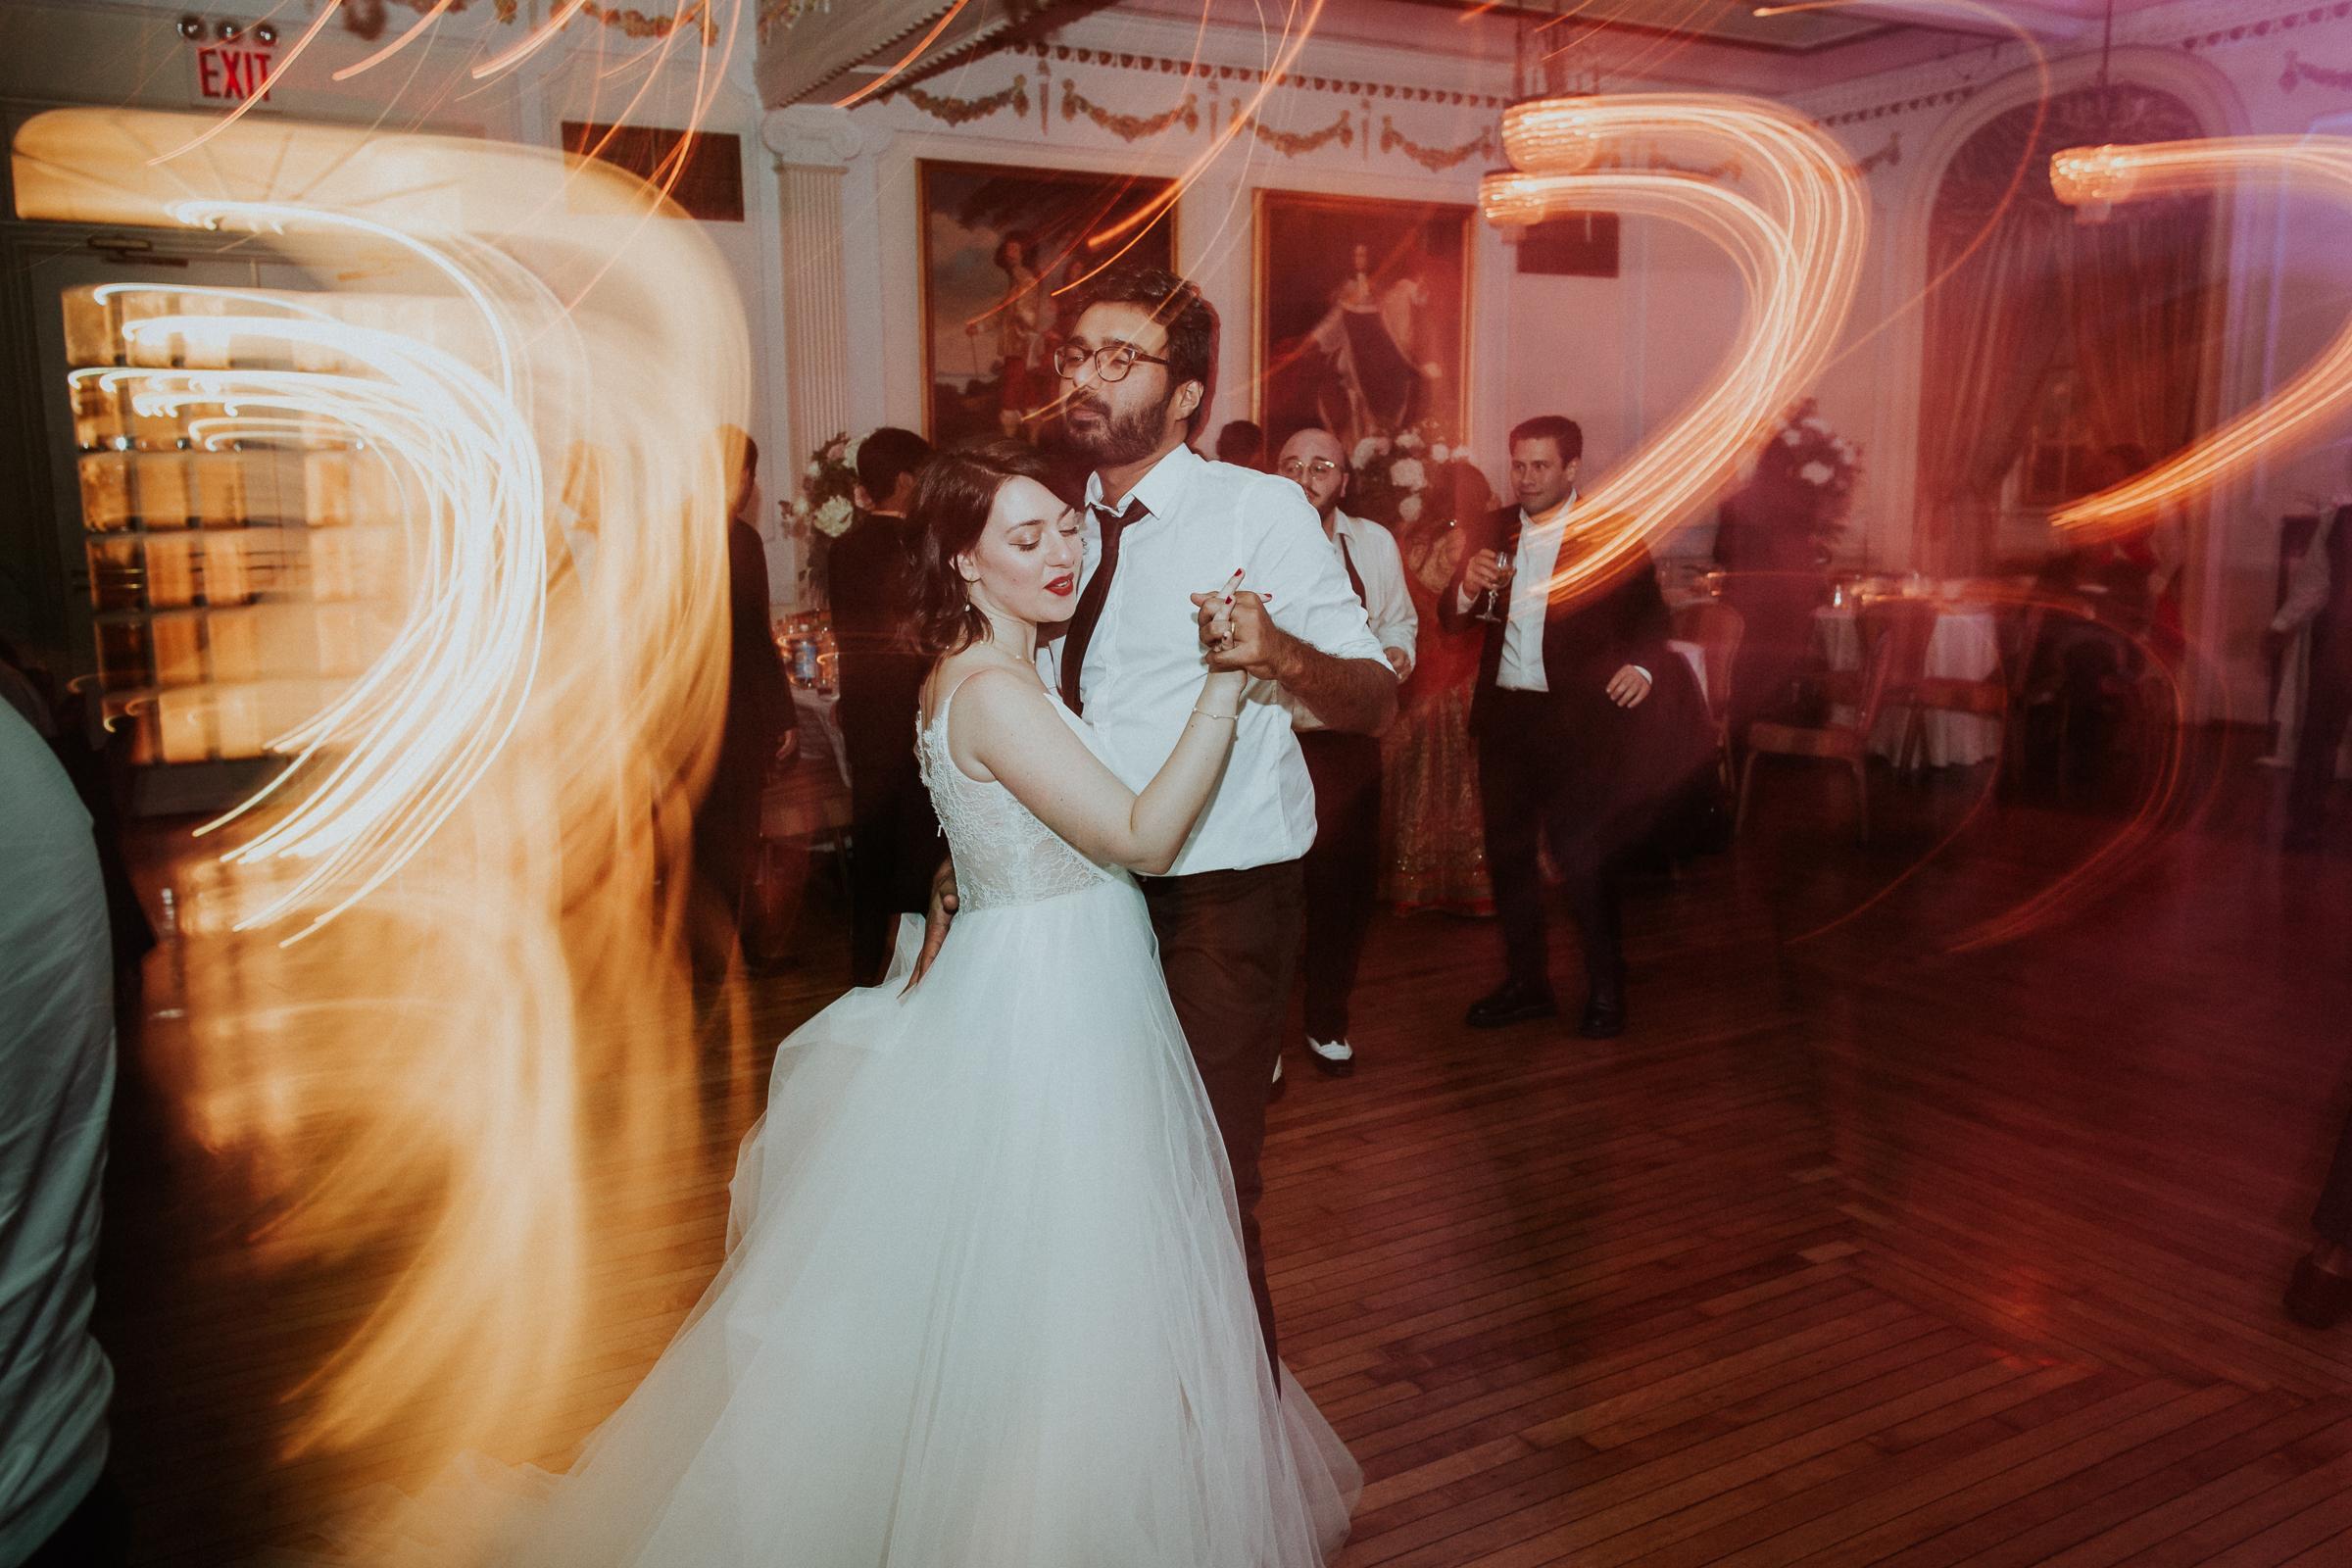 New-York-Documentary-Wedding-Photography-Best-Of-2017-by-Elvira-Kalviste-Photography-131.jpg